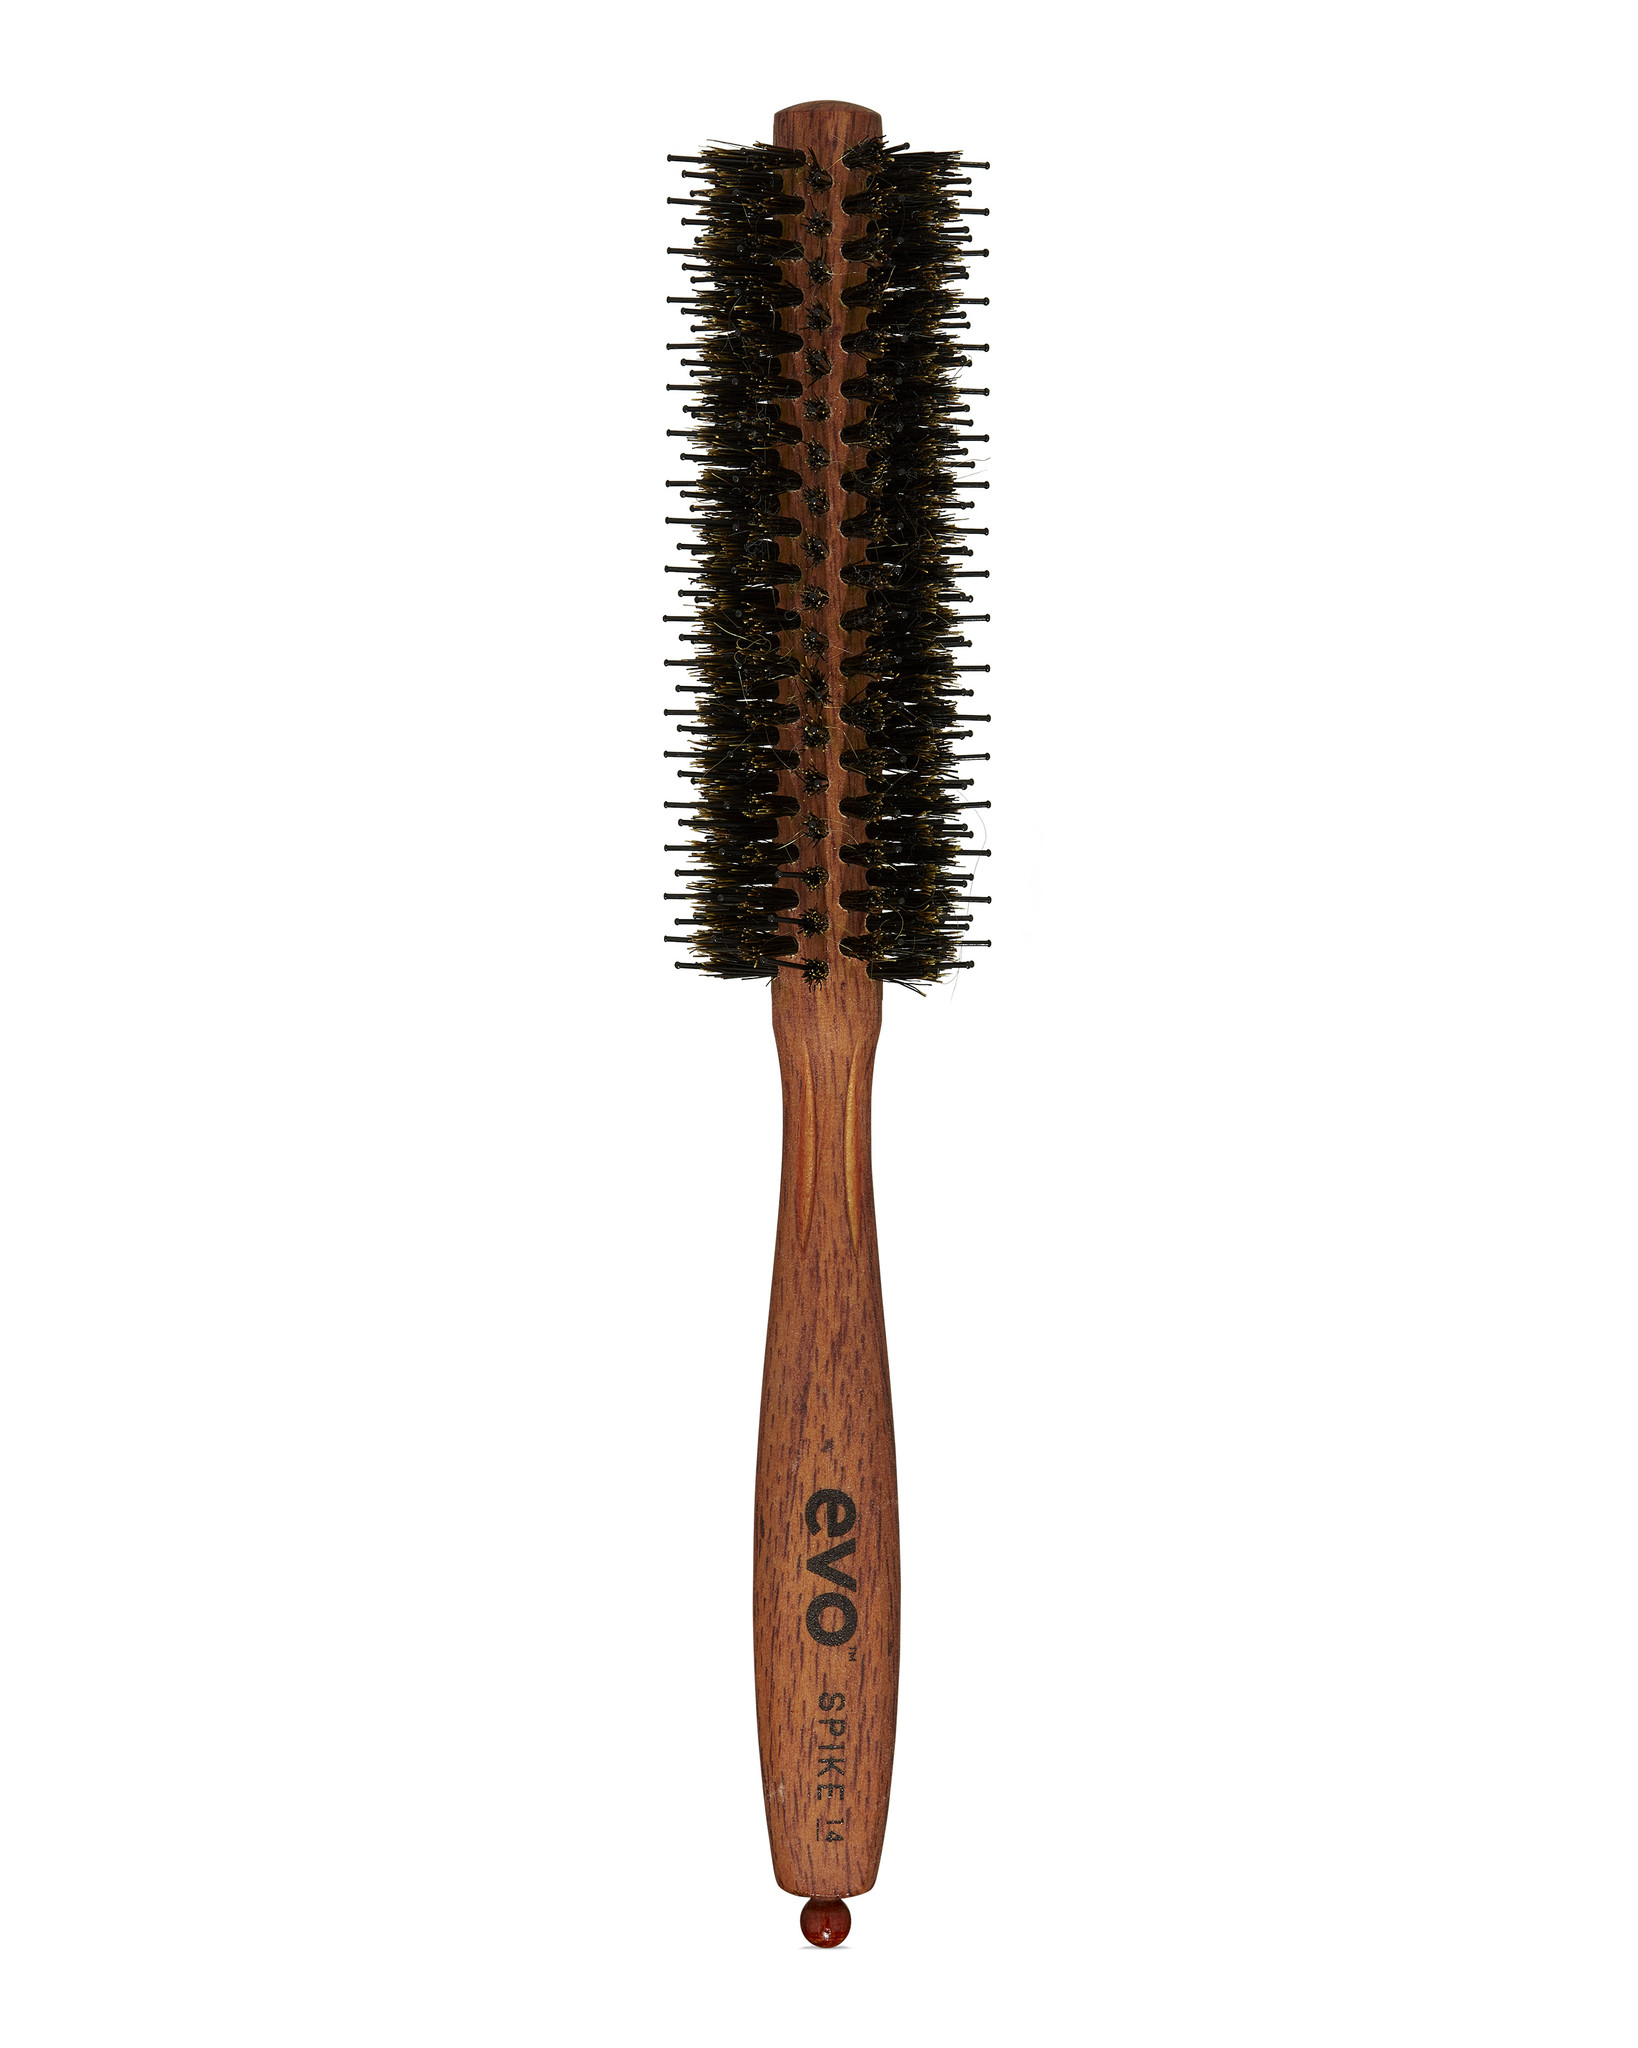 EVO Brosse SPIKE ronde à poils et picots 14mm